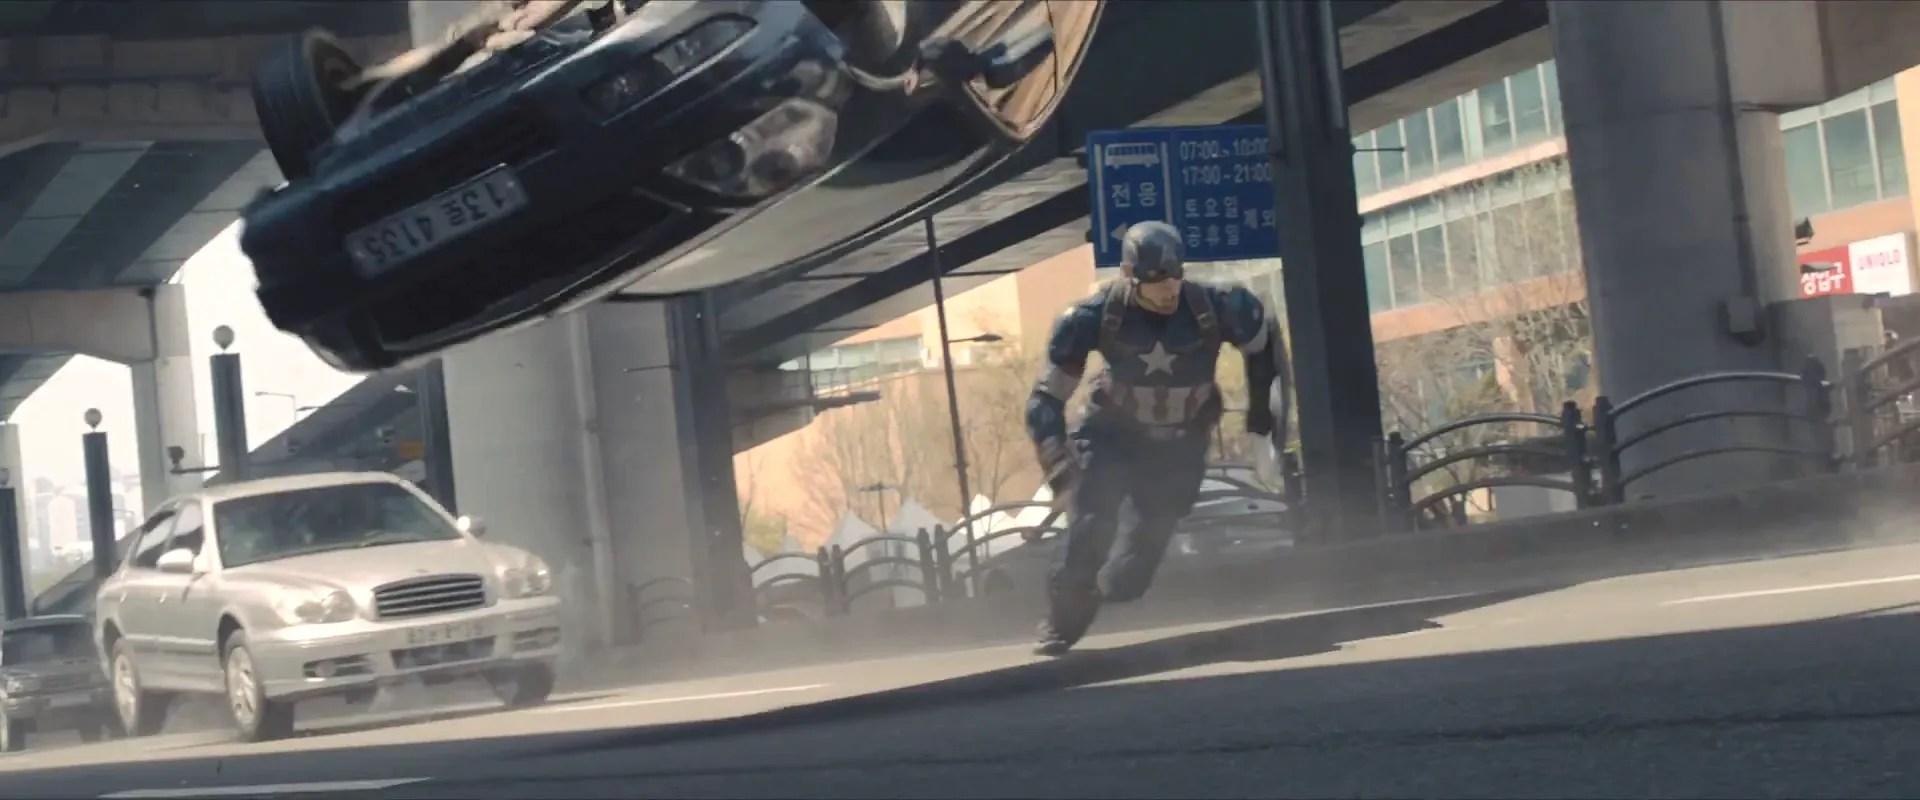 https://i1.wp.com/cdn.collider.com/wp-content/uploads/avengers-age-of-ultron-trailer-screengrab-28-captain-america.png